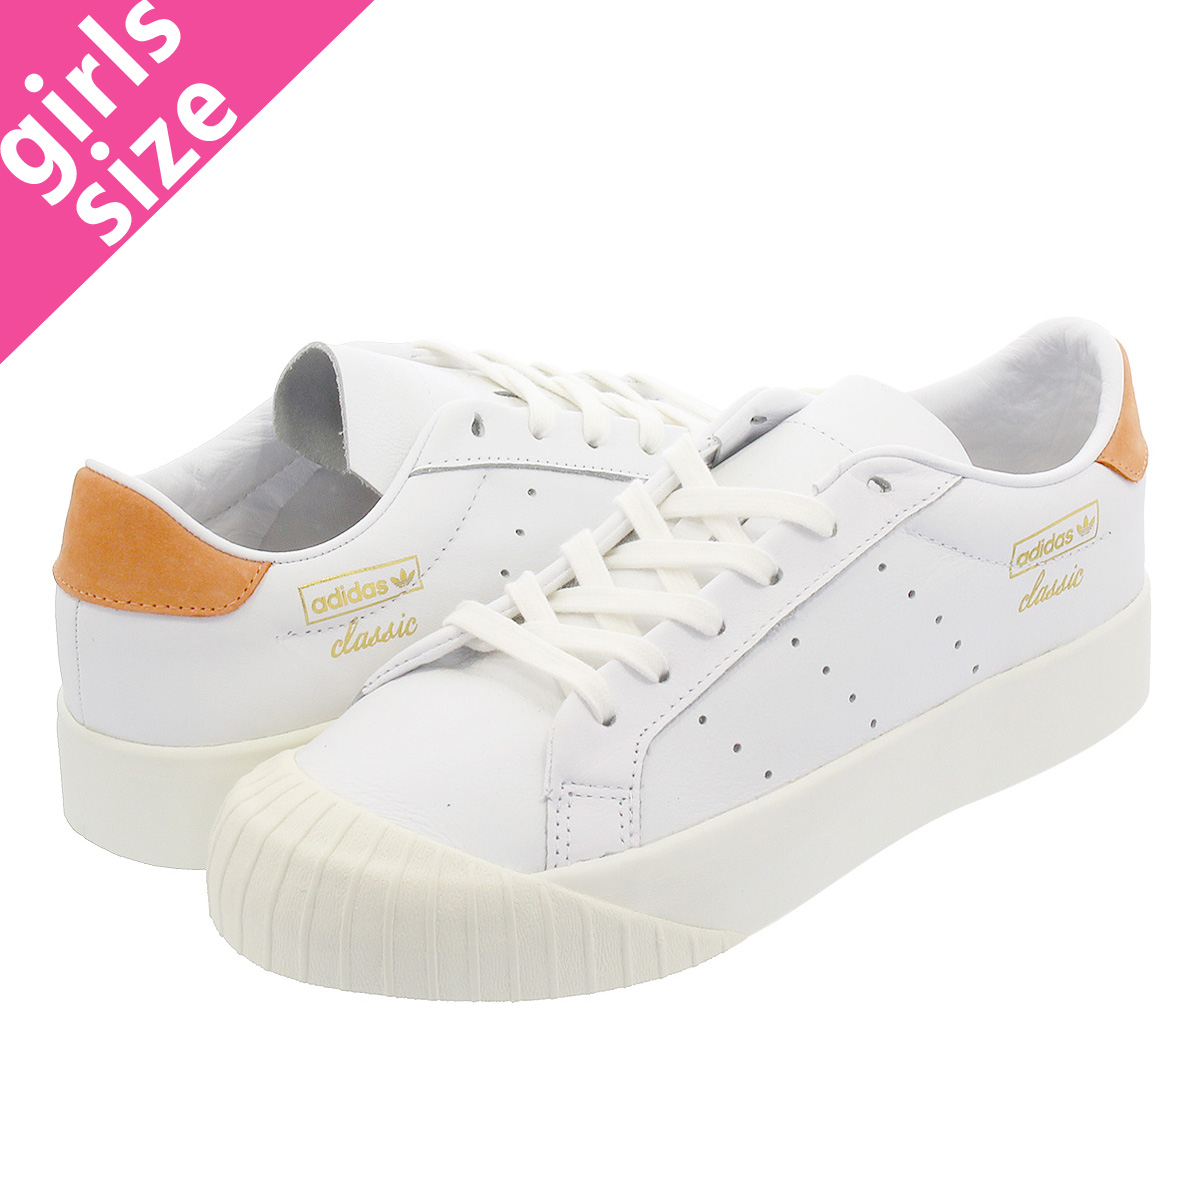 competitive price 3b3b3 3f889 SELECT SHOP LOWTEX adidas EVERYN W Adidas Ebb phosphorus women RUNNING  WHITERUNNIN WHITEEASY ORANGE cg6181  Rakuten Global Market